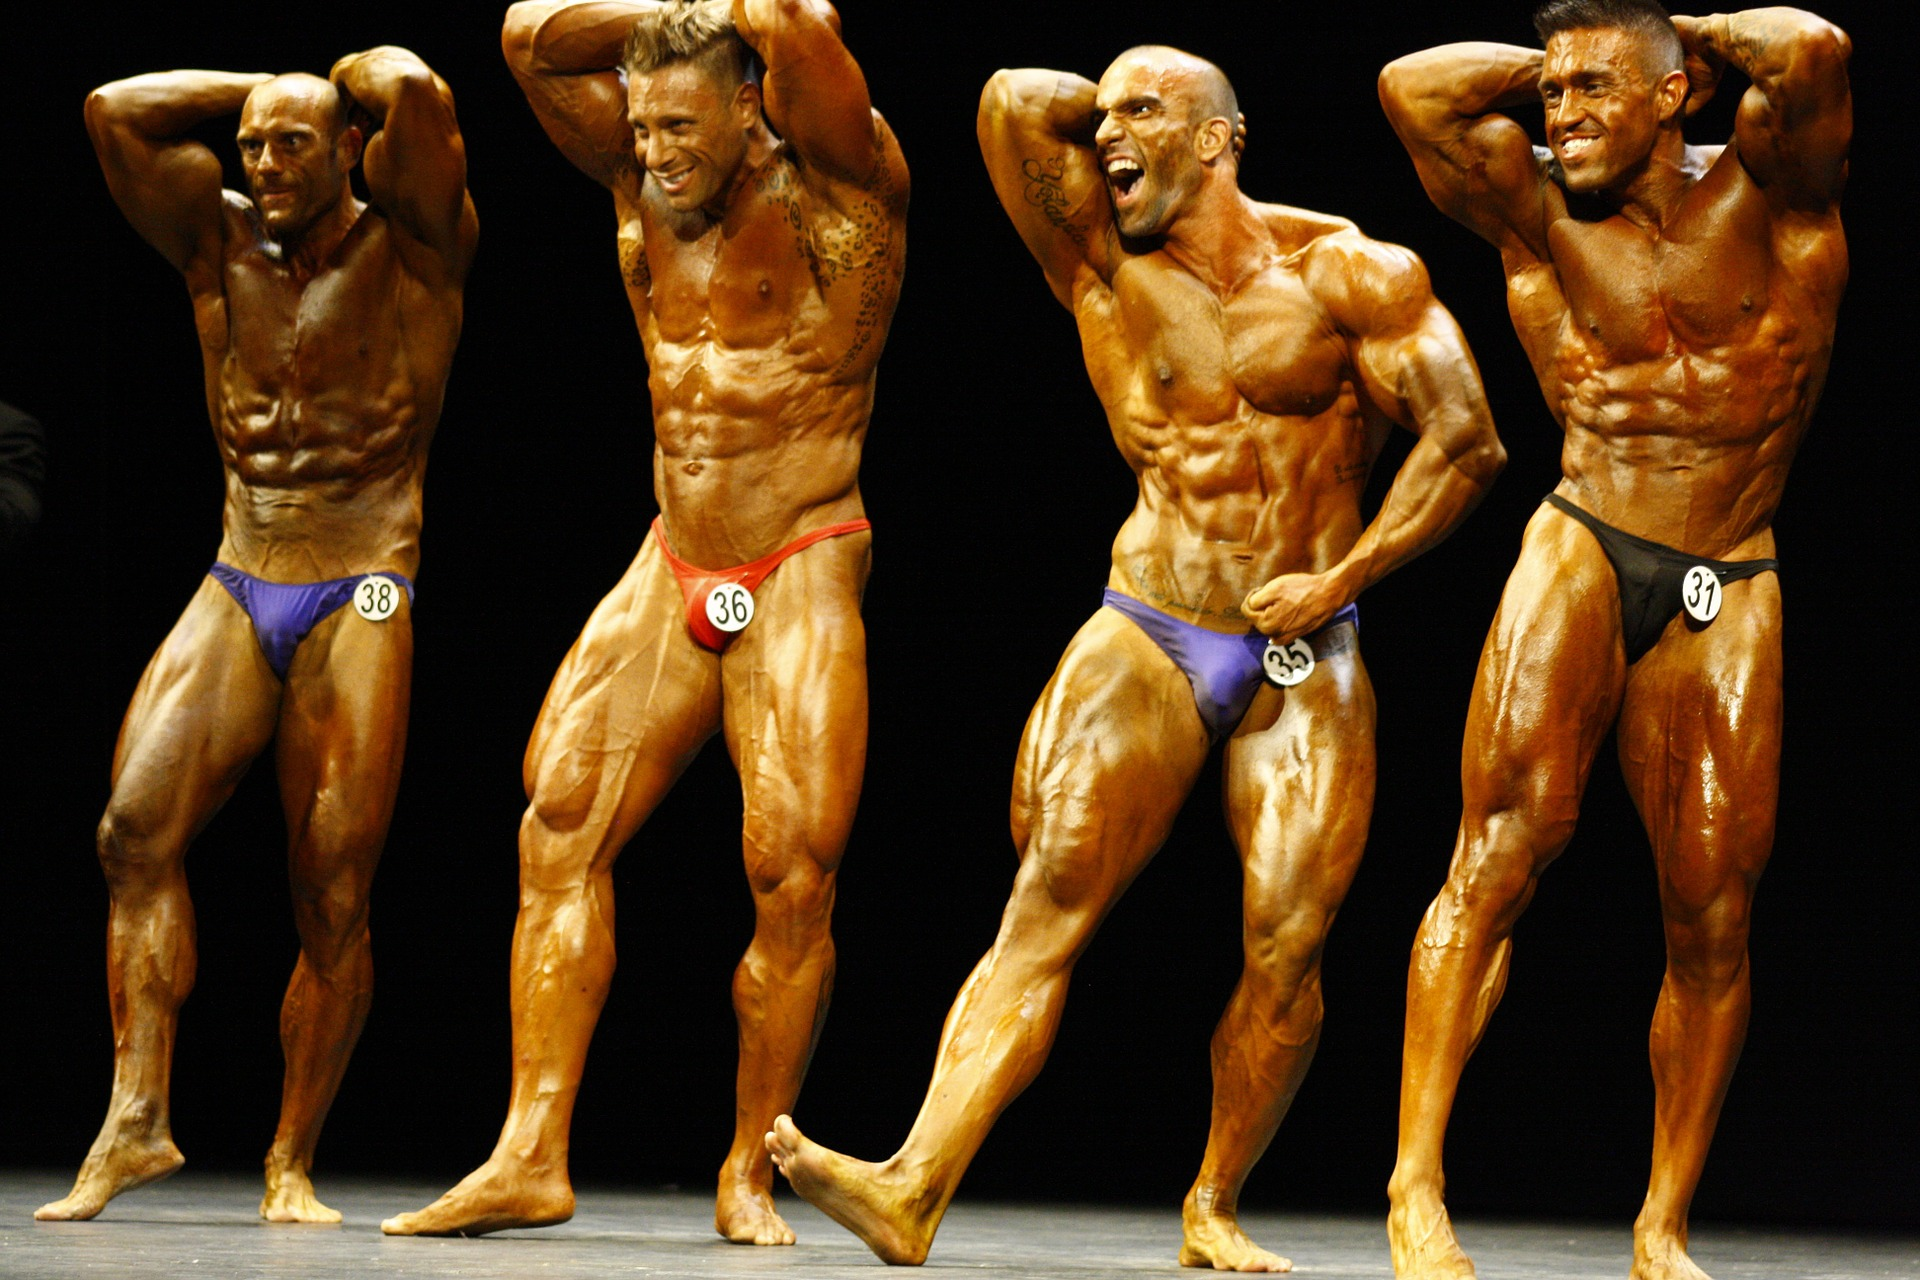 Regime paleo bodybuilding